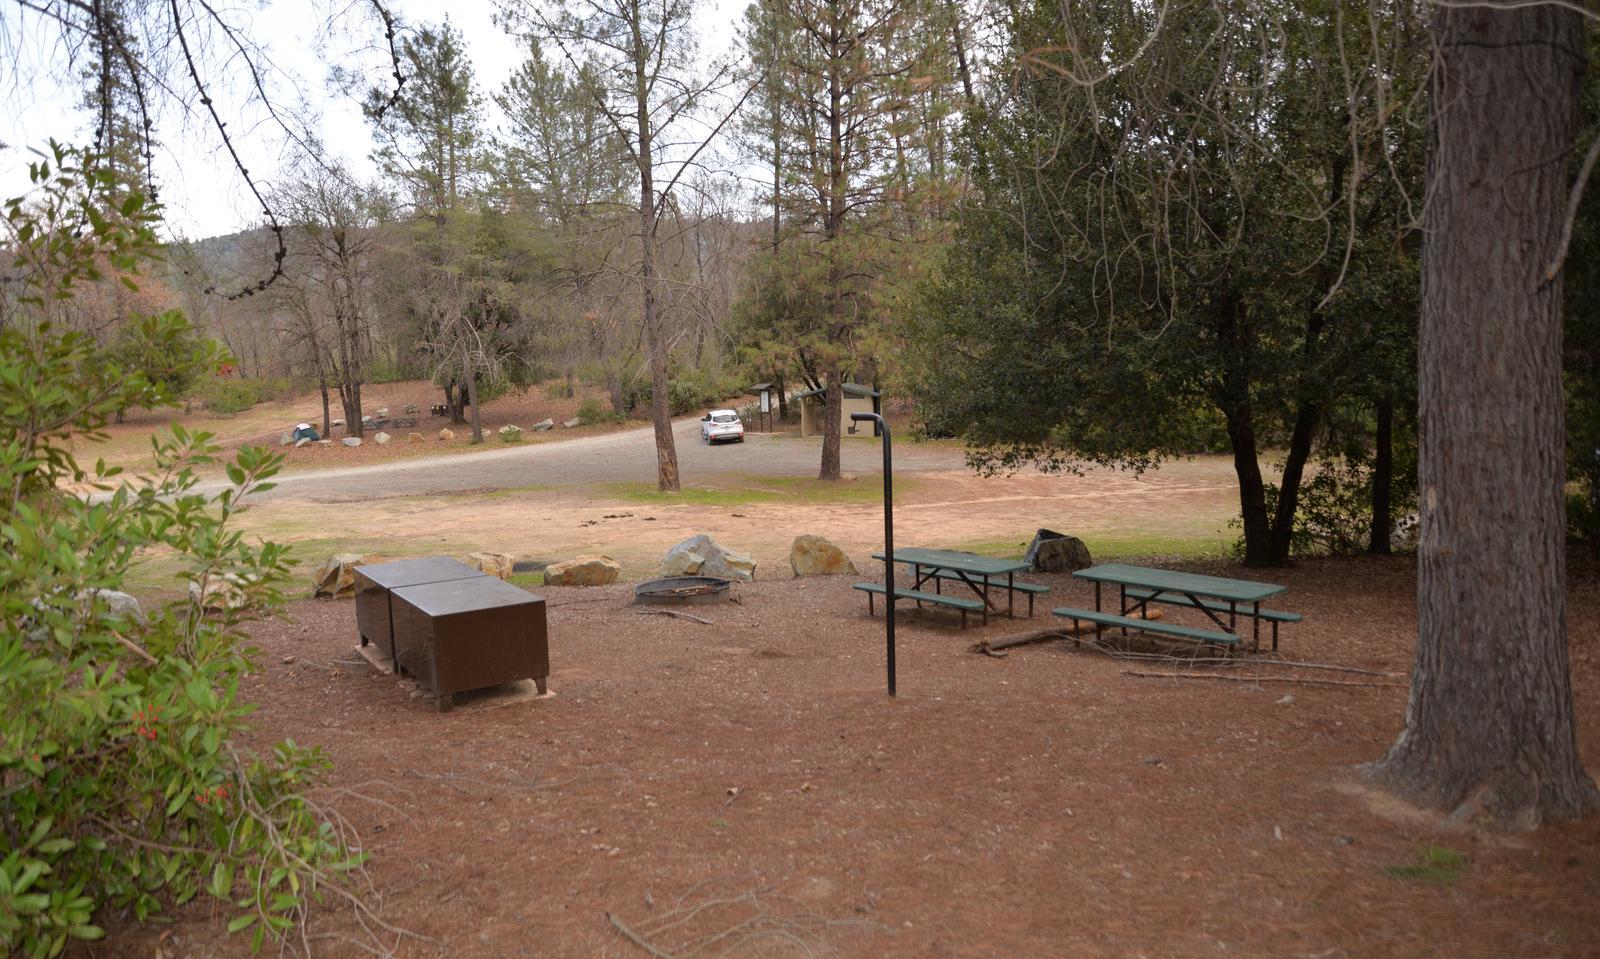 Alternate View of Site # 2Alternate View of Site 2